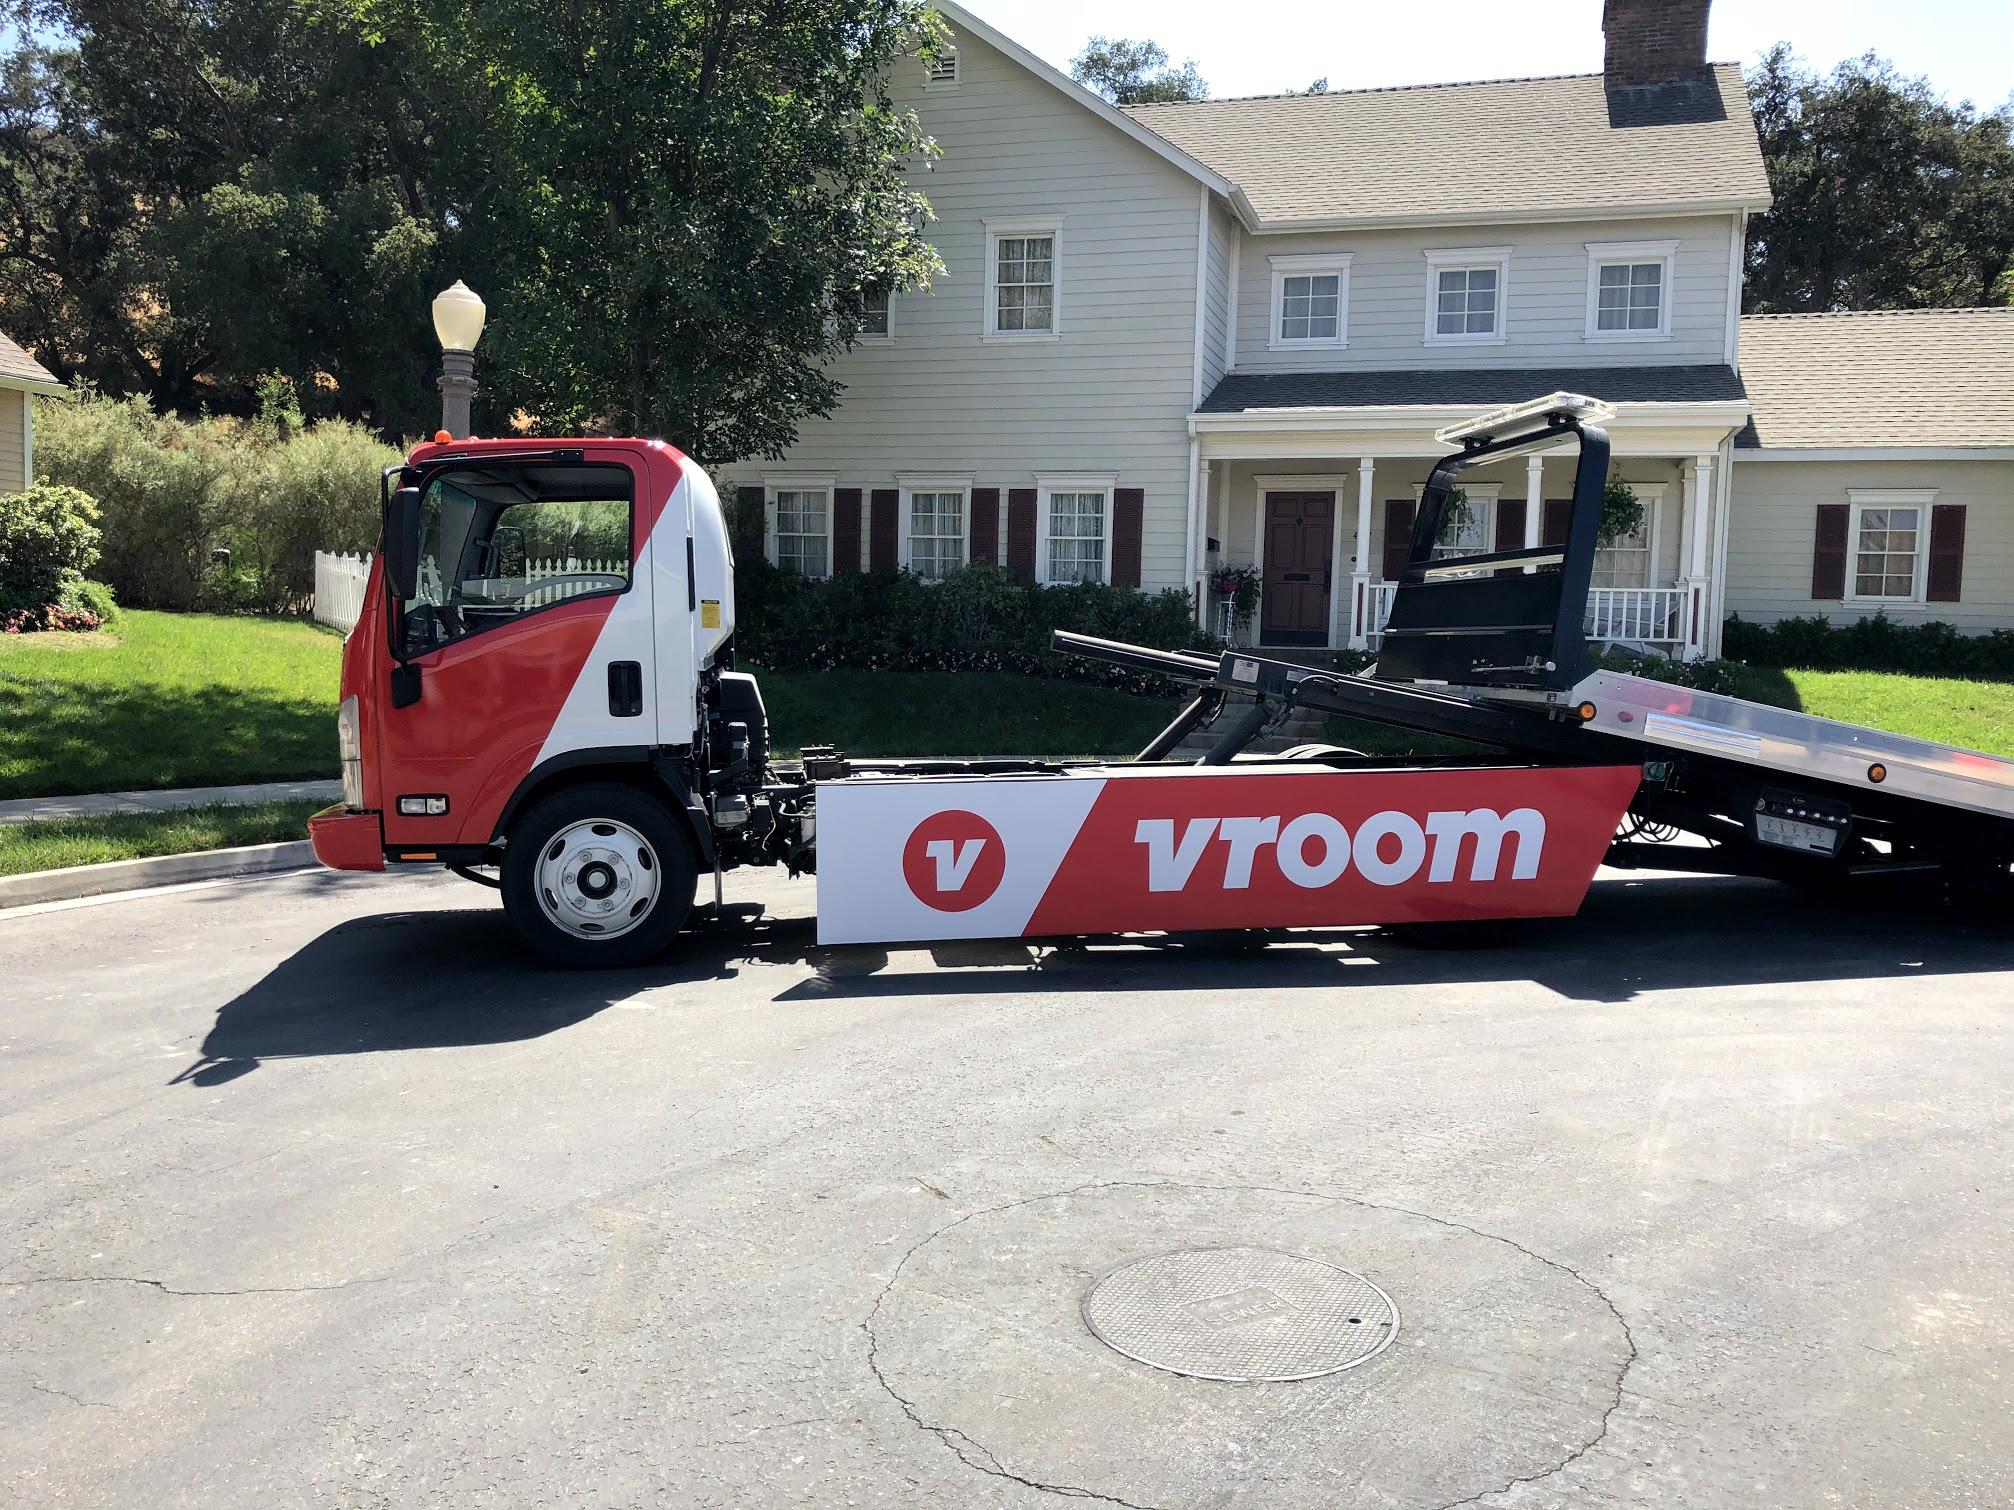 Vroom Announces $300 Million Acquisition of United Auto Credit